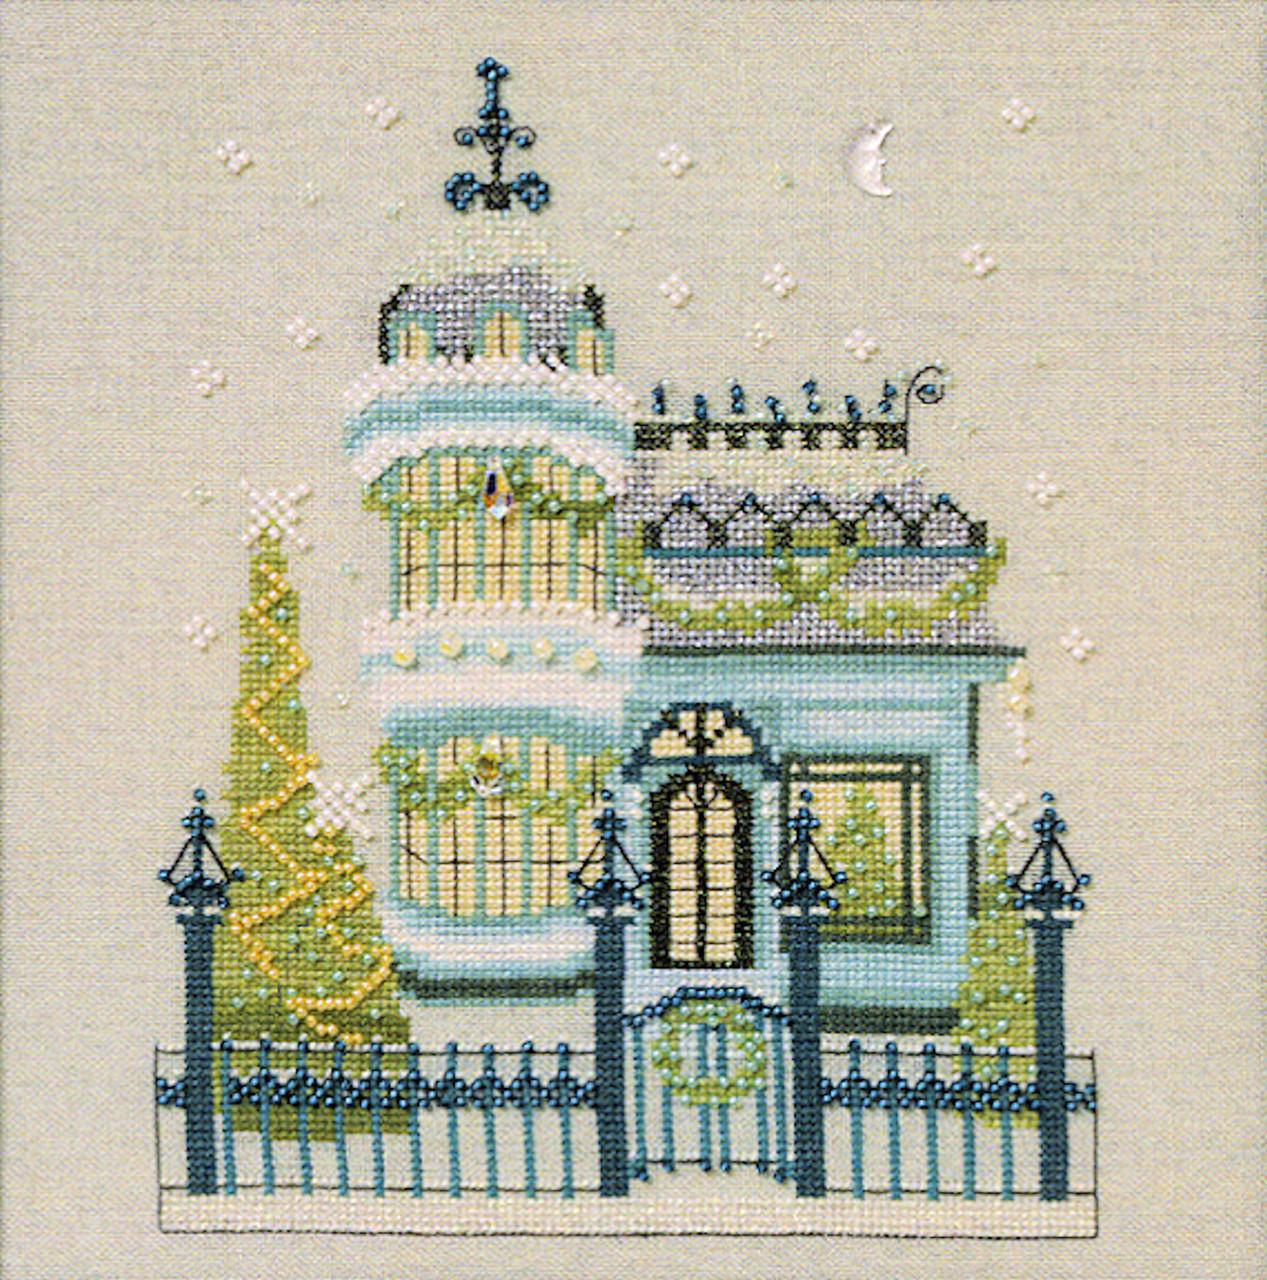 Nora Corbett - The Victorian House